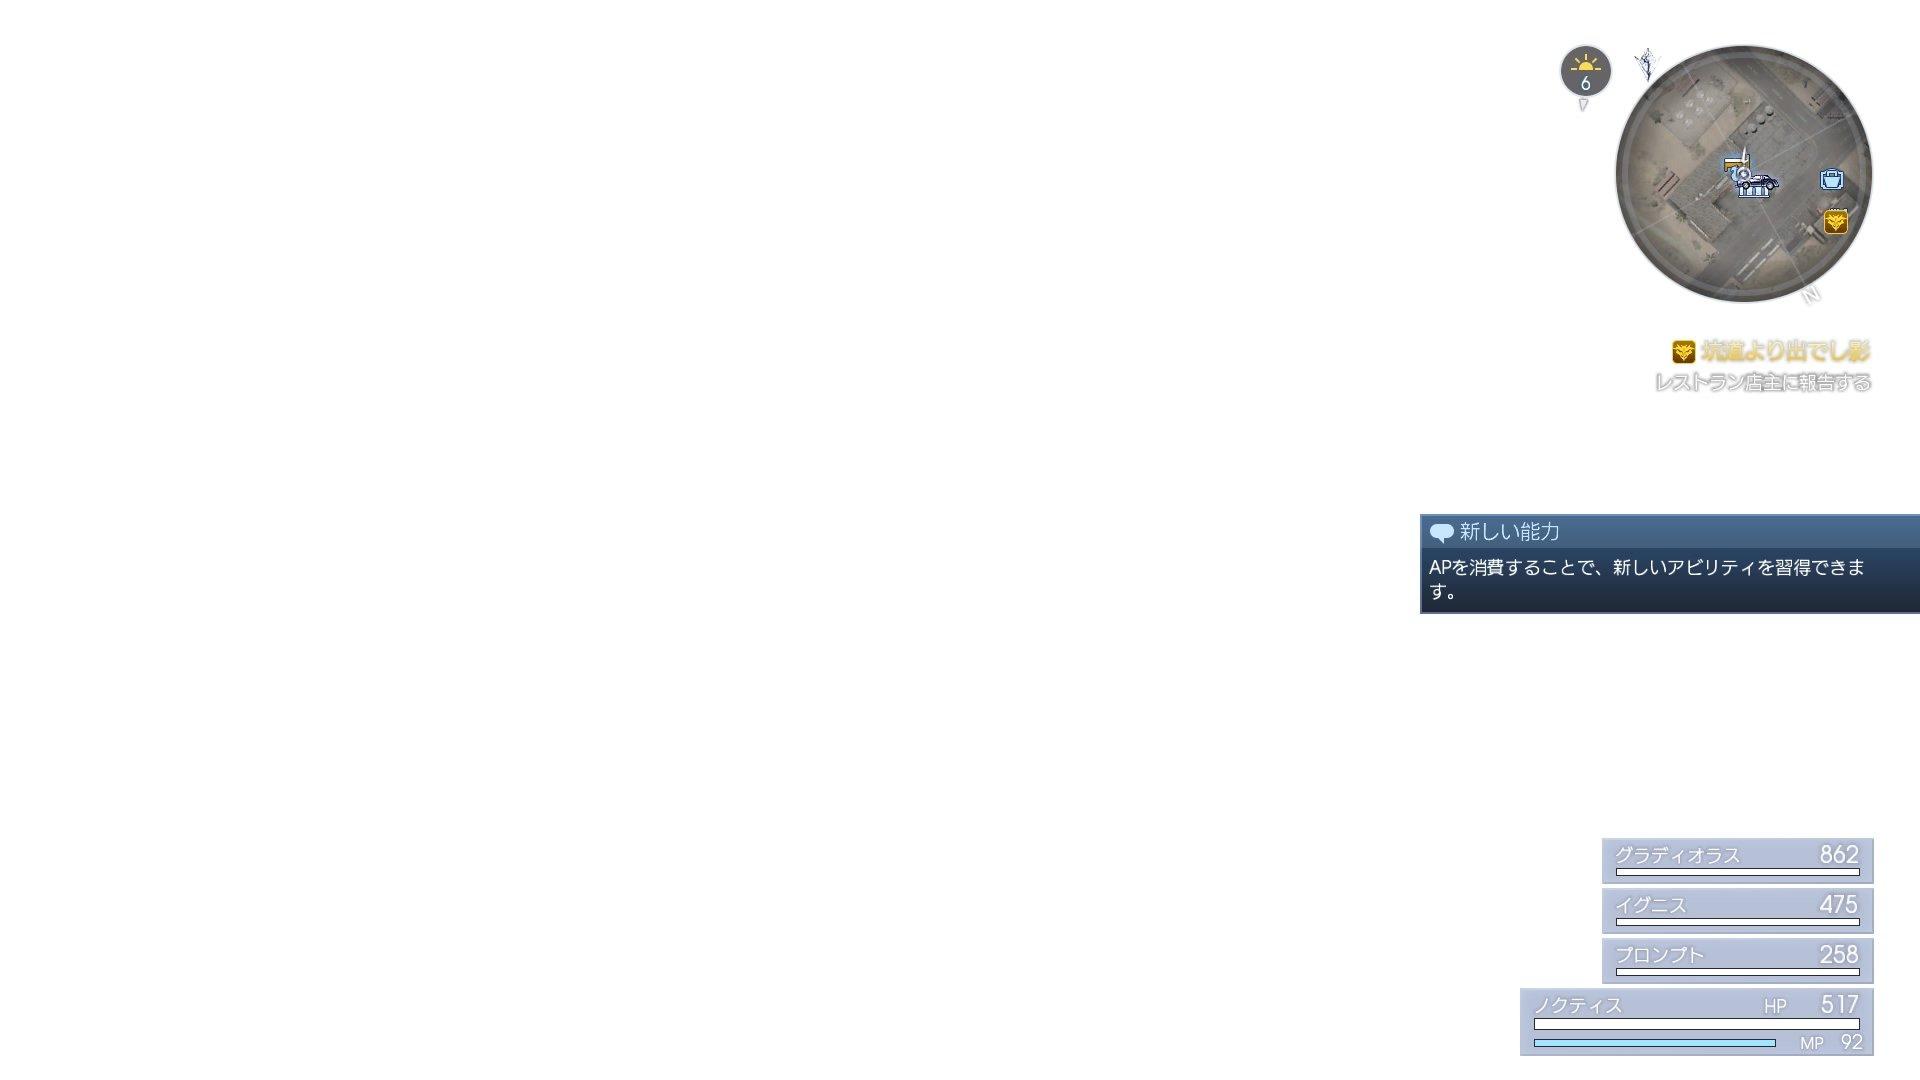 FINAL FANTASY XV JUDGMENT DISC_20161111153010.jpg